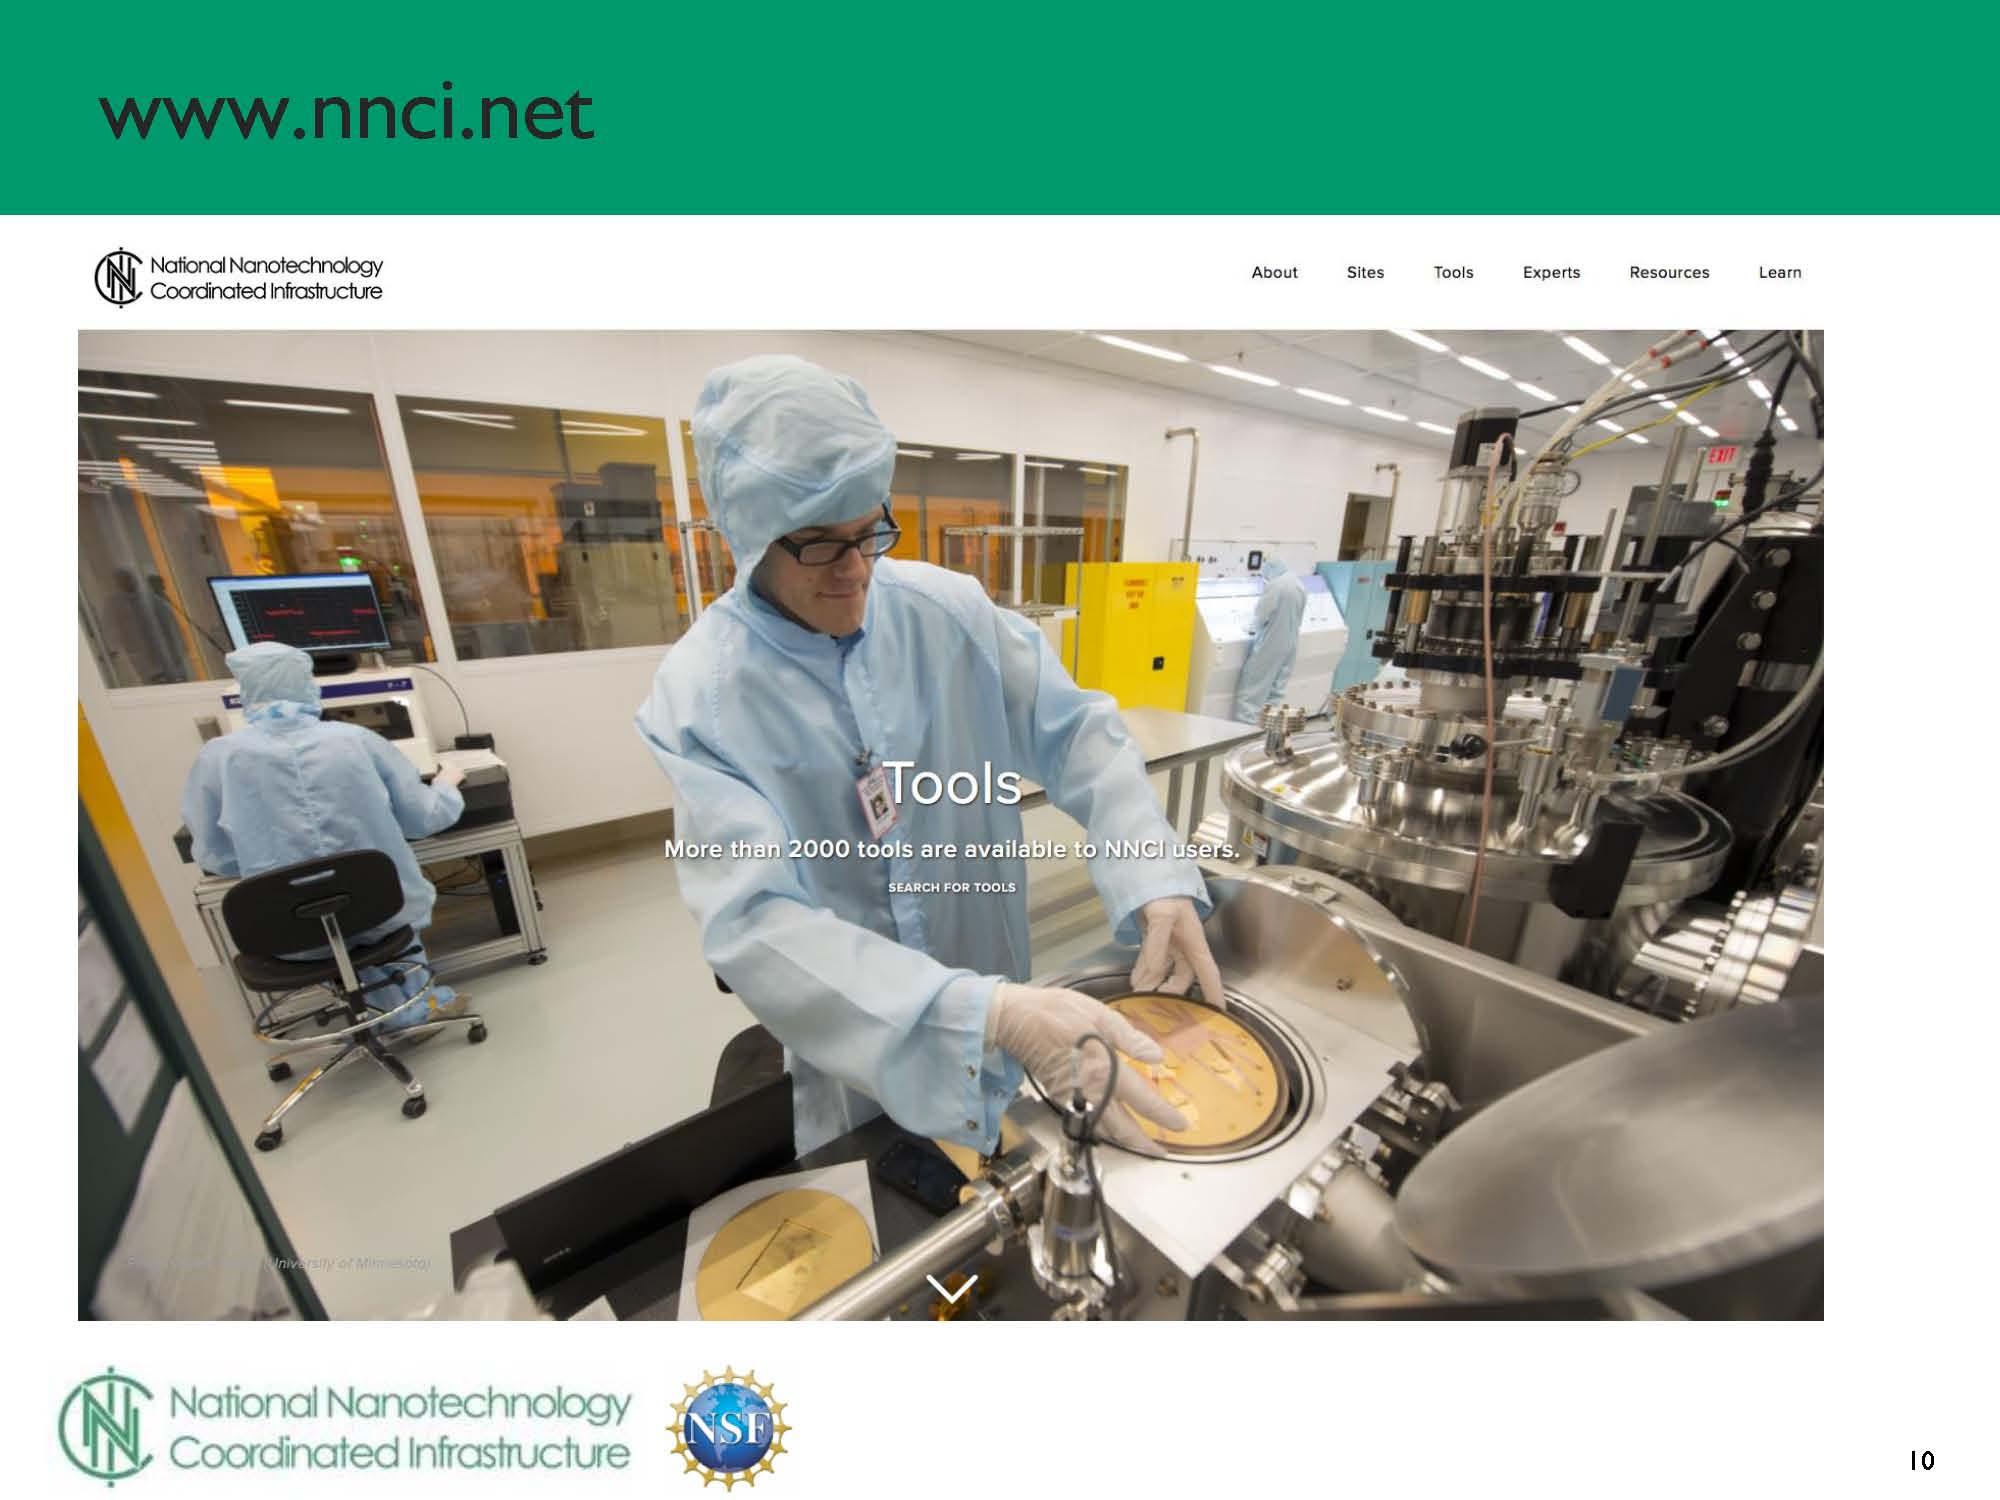 NSF 2017 NanoscienceGrantees Conf - NNCI presentation by Mark Allen_Page_10.jpg